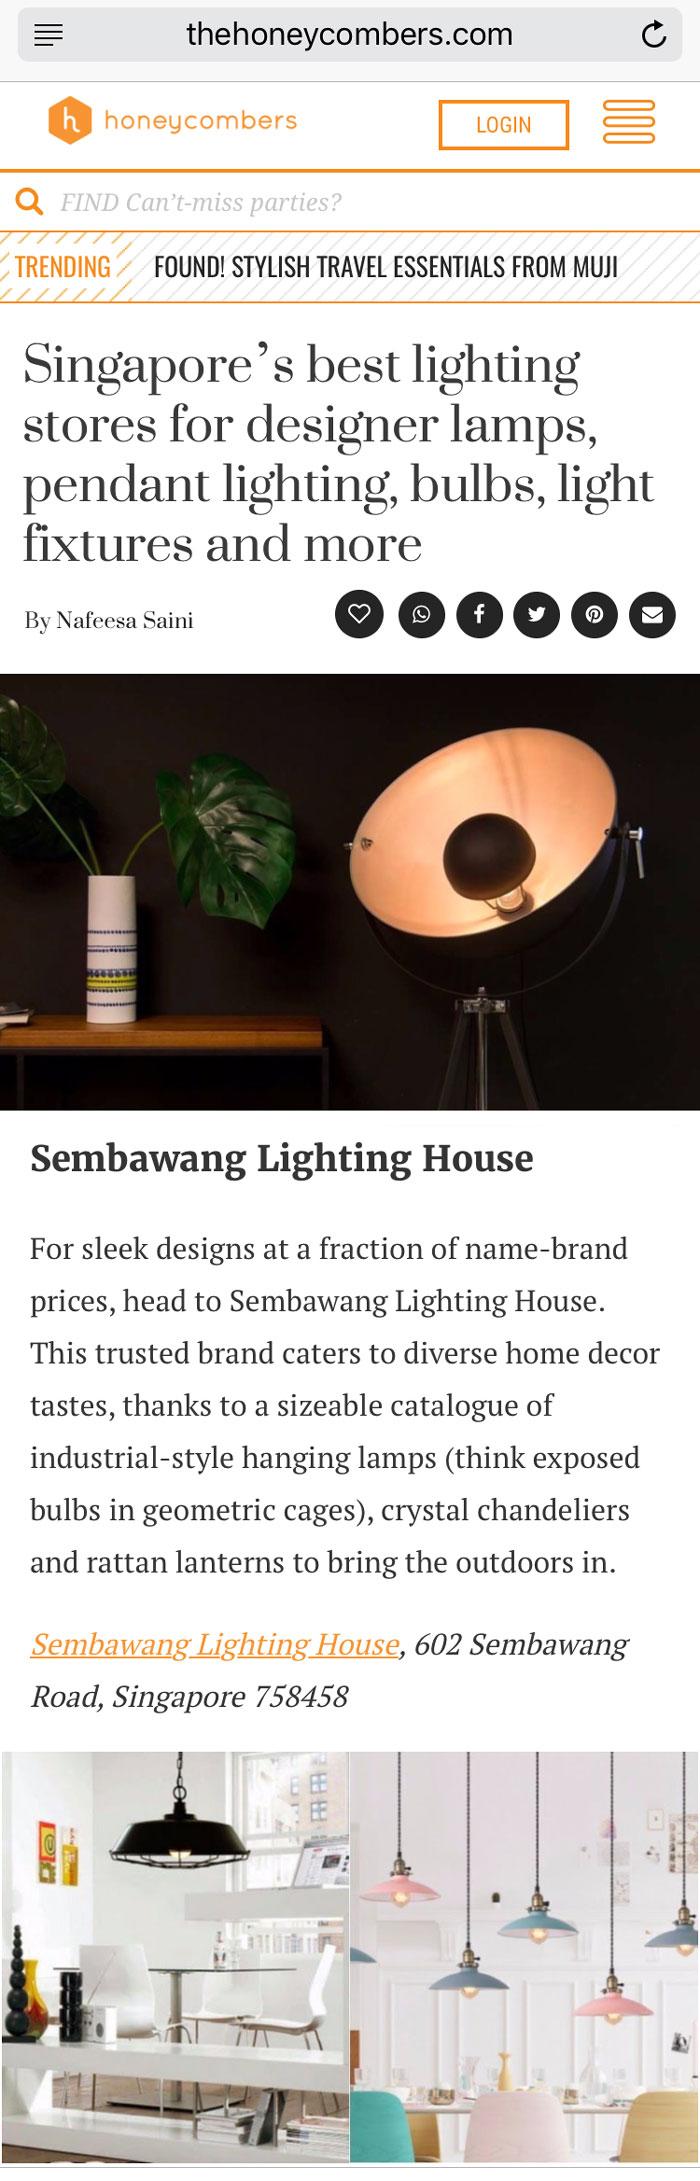 honeycombers-sembawang-lighting-house-review.jpg